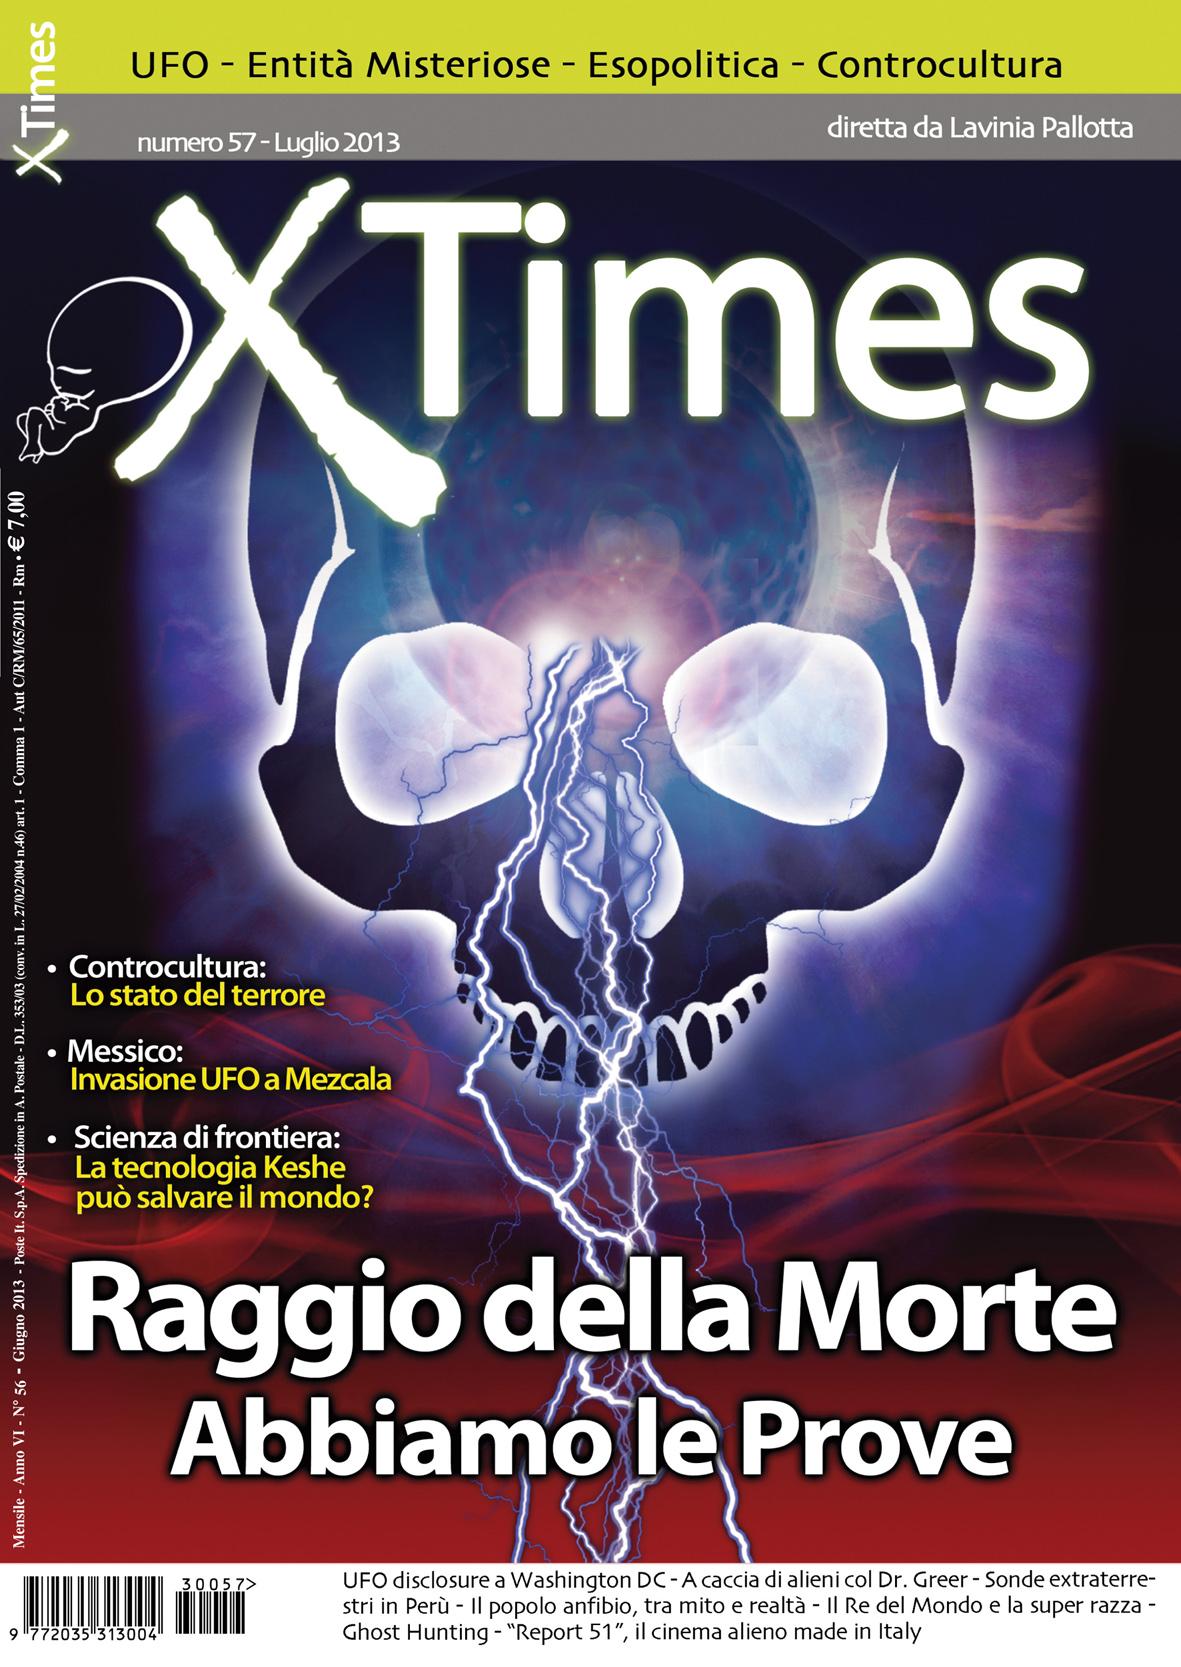 01 - 84 copertina 56 Xtimes _01 - copertina X-Times1